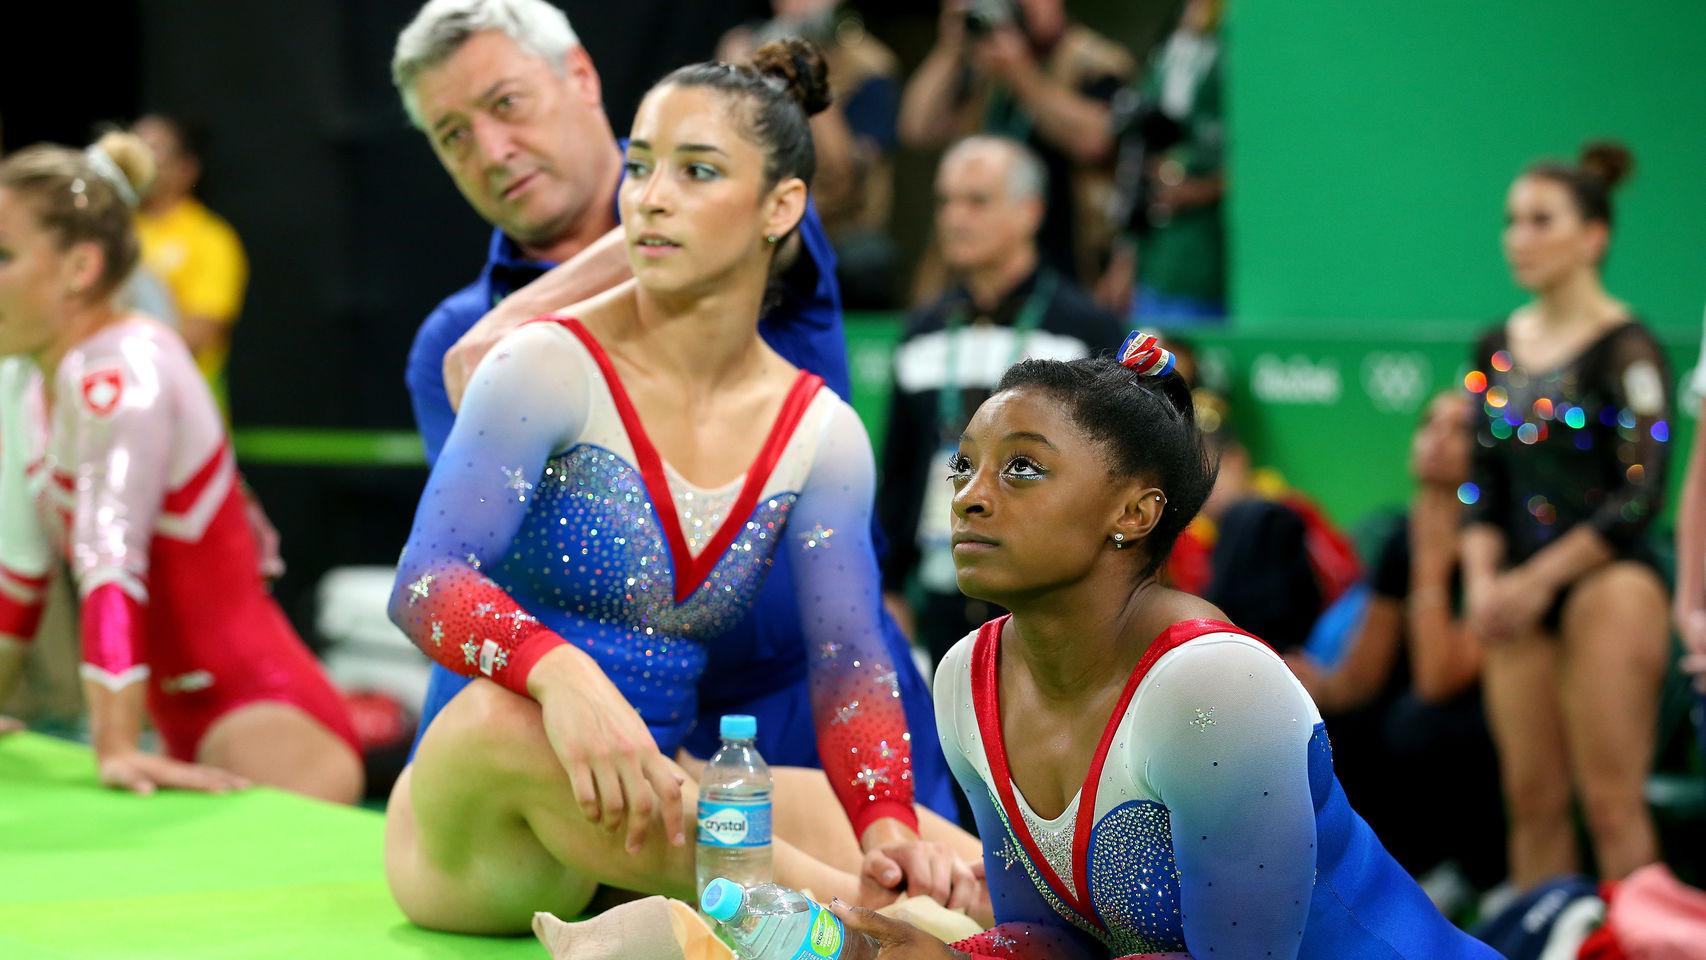 Comité Olímpico de EE. UU. no protegió a gimnastas de sufrir abuso